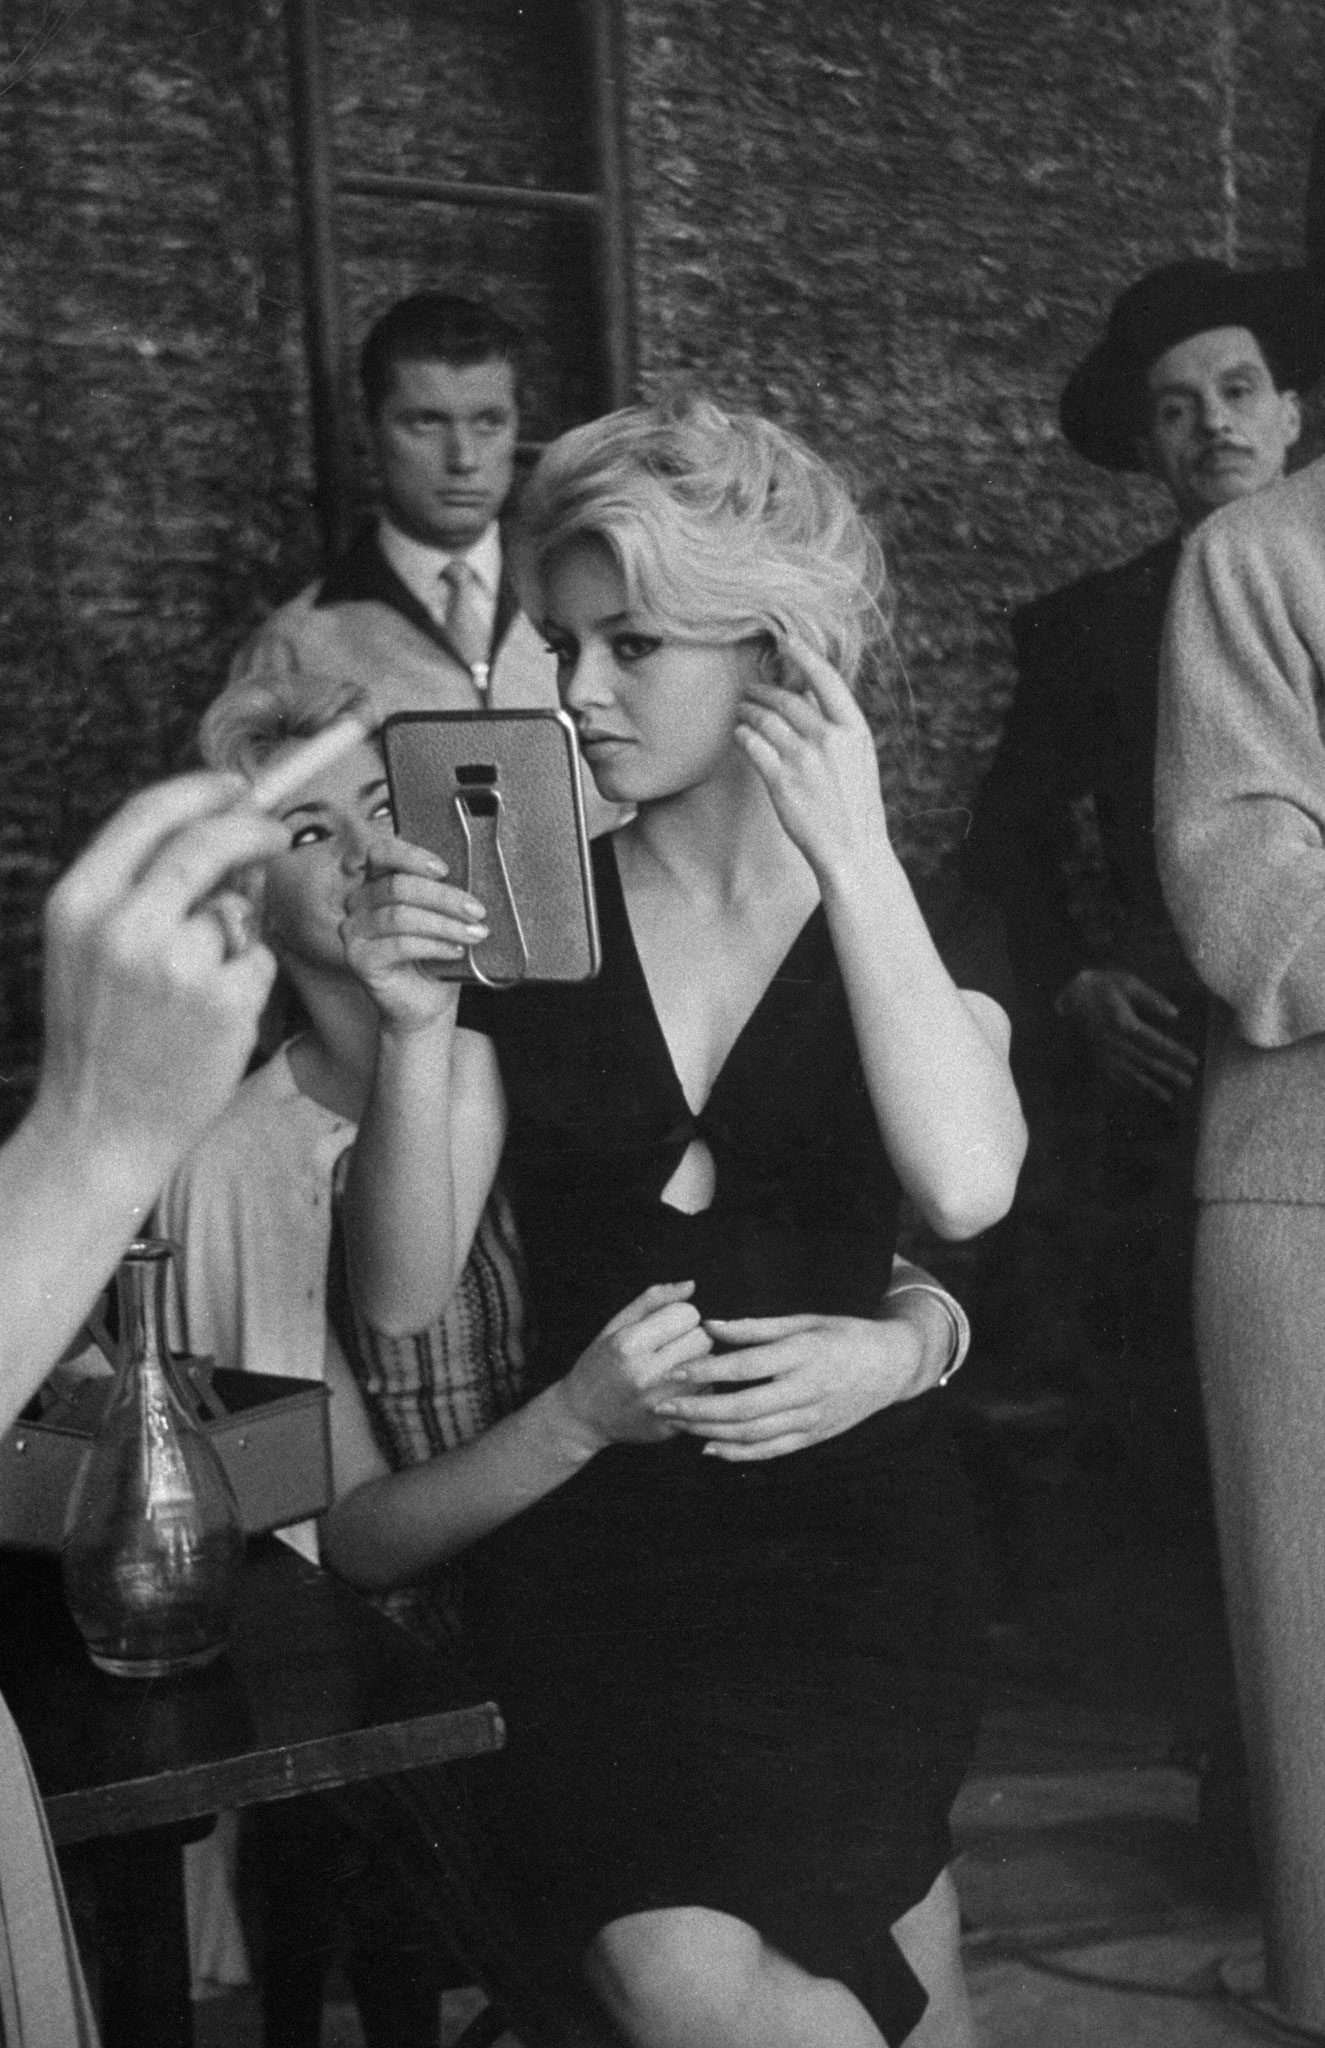 Brigitte Bardot checks her hair and makeup on the set of the film, <i>La Femme et le Pantin</i>, Spain, 1958.